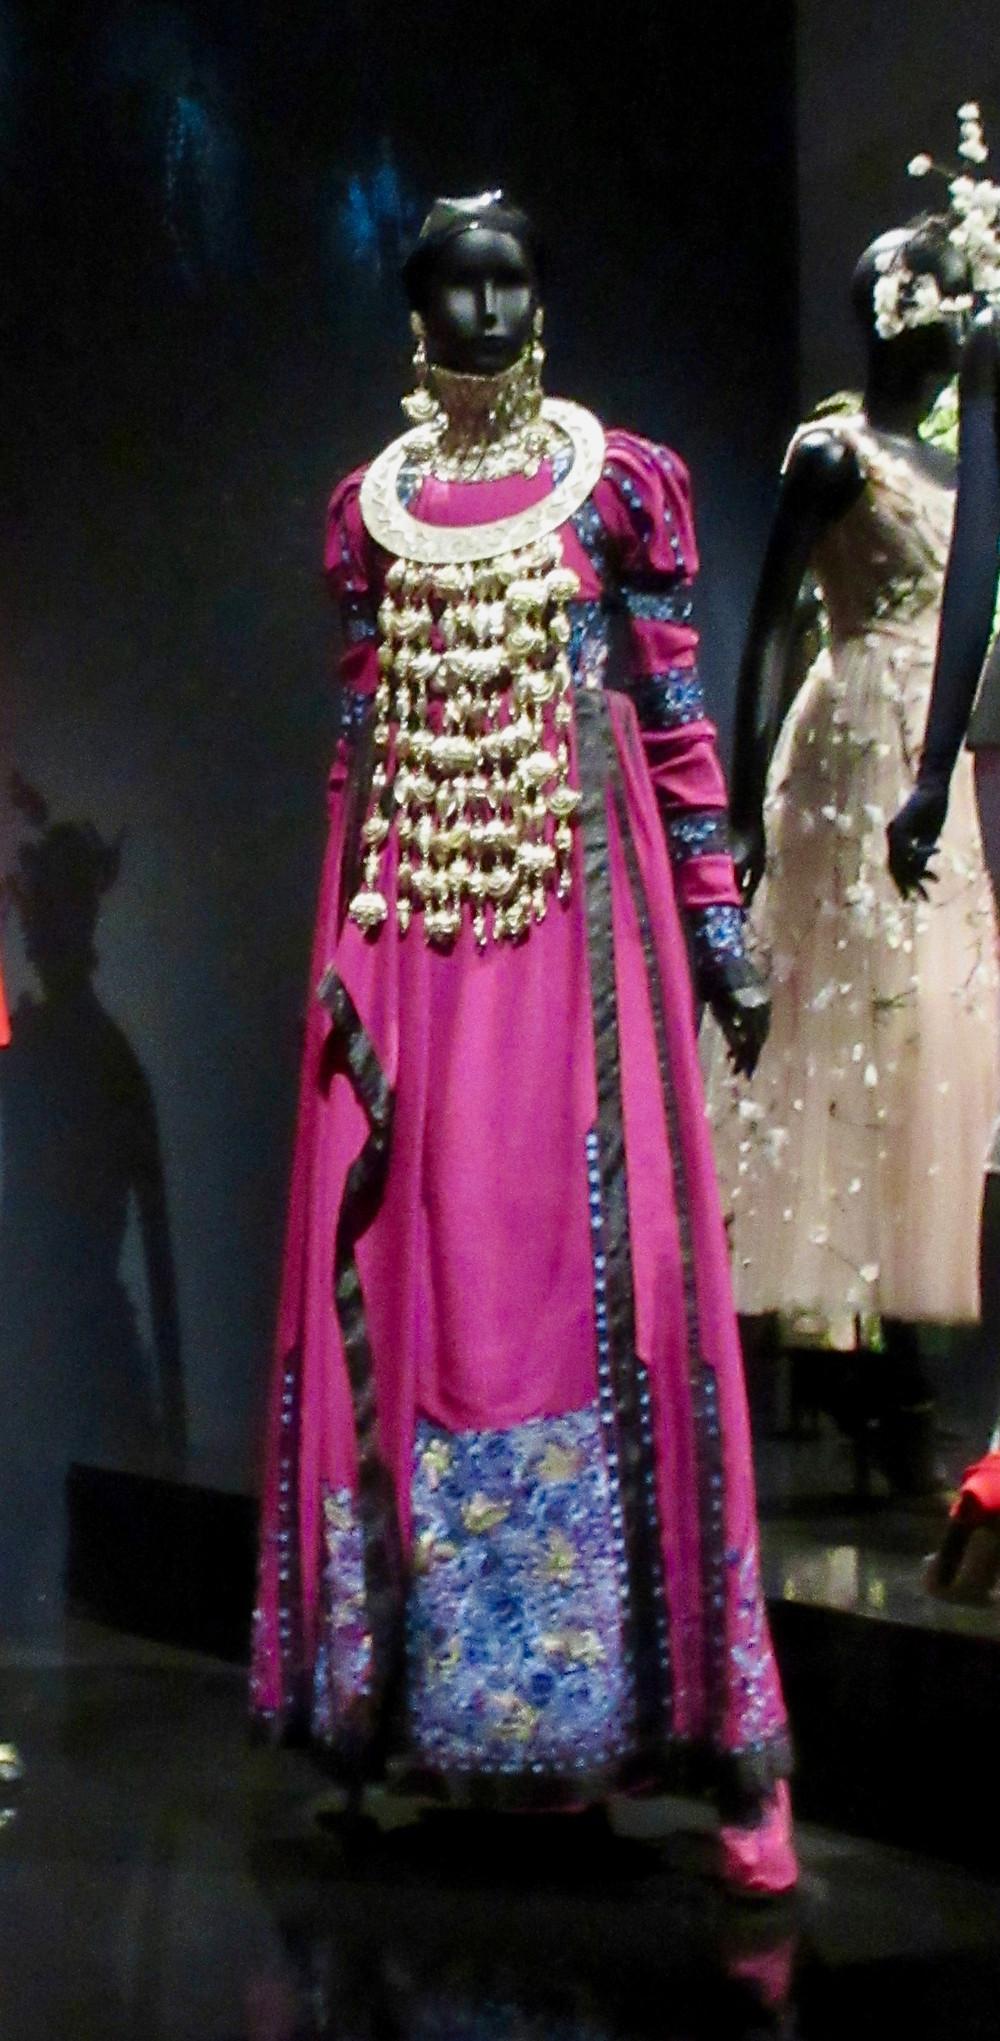 Principessa Eleanora ensemble, Galliano Haute Couture Autumn Winter 1998 Silk Faconne and Metal